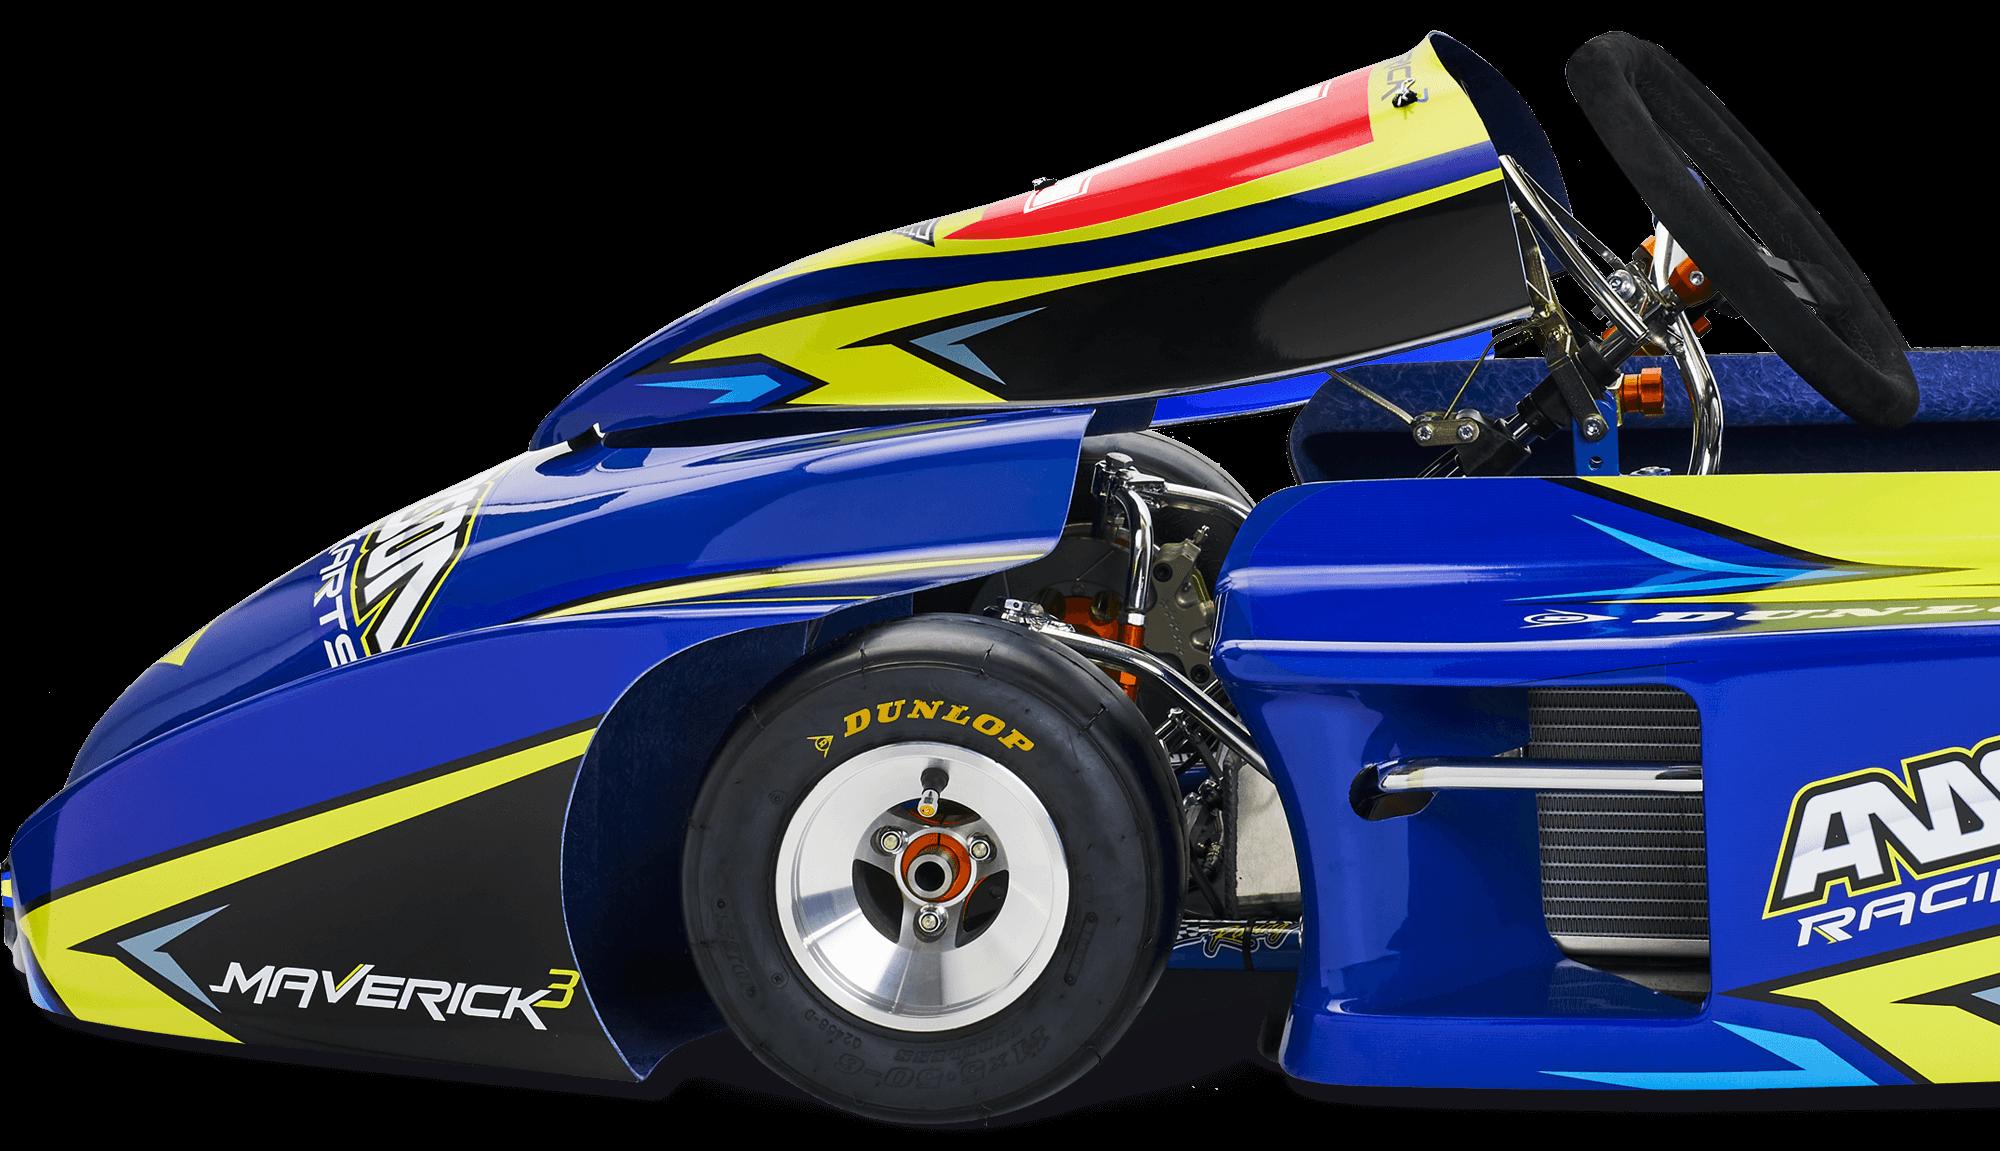 Anderson 125 Long Circuit Superkart